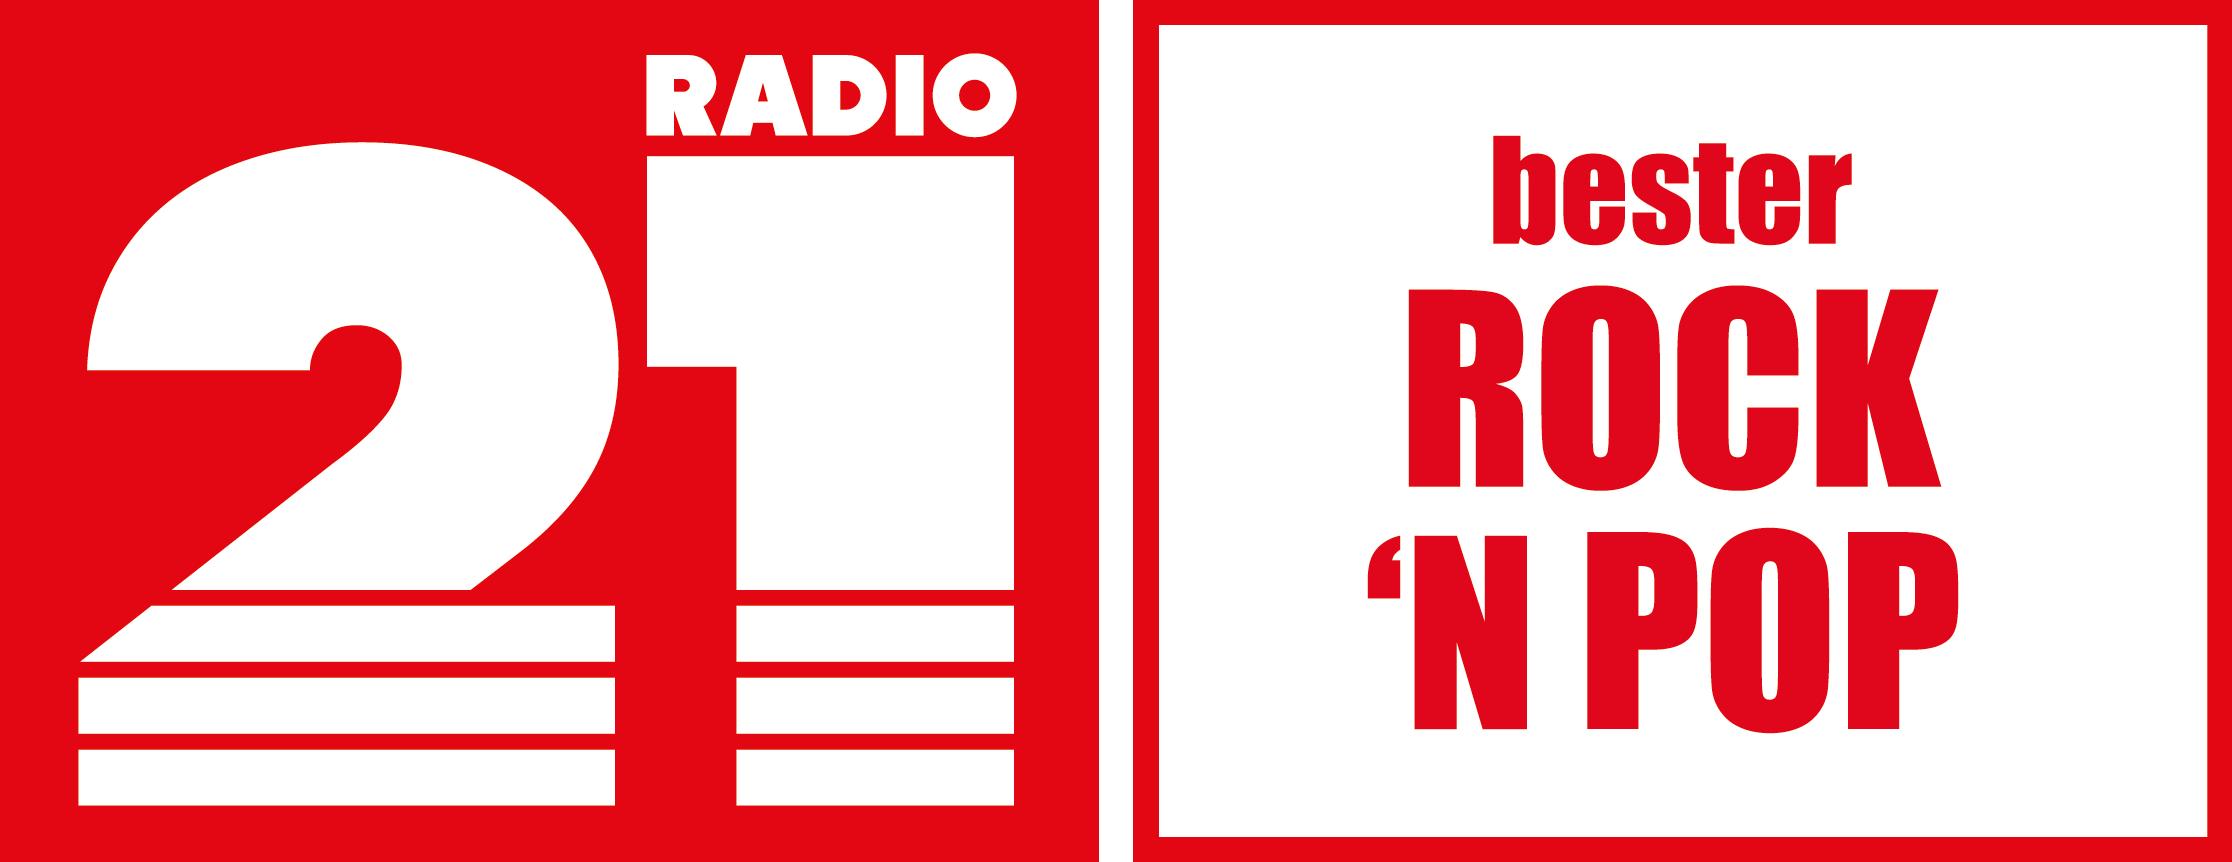 Radio 21 Bremen